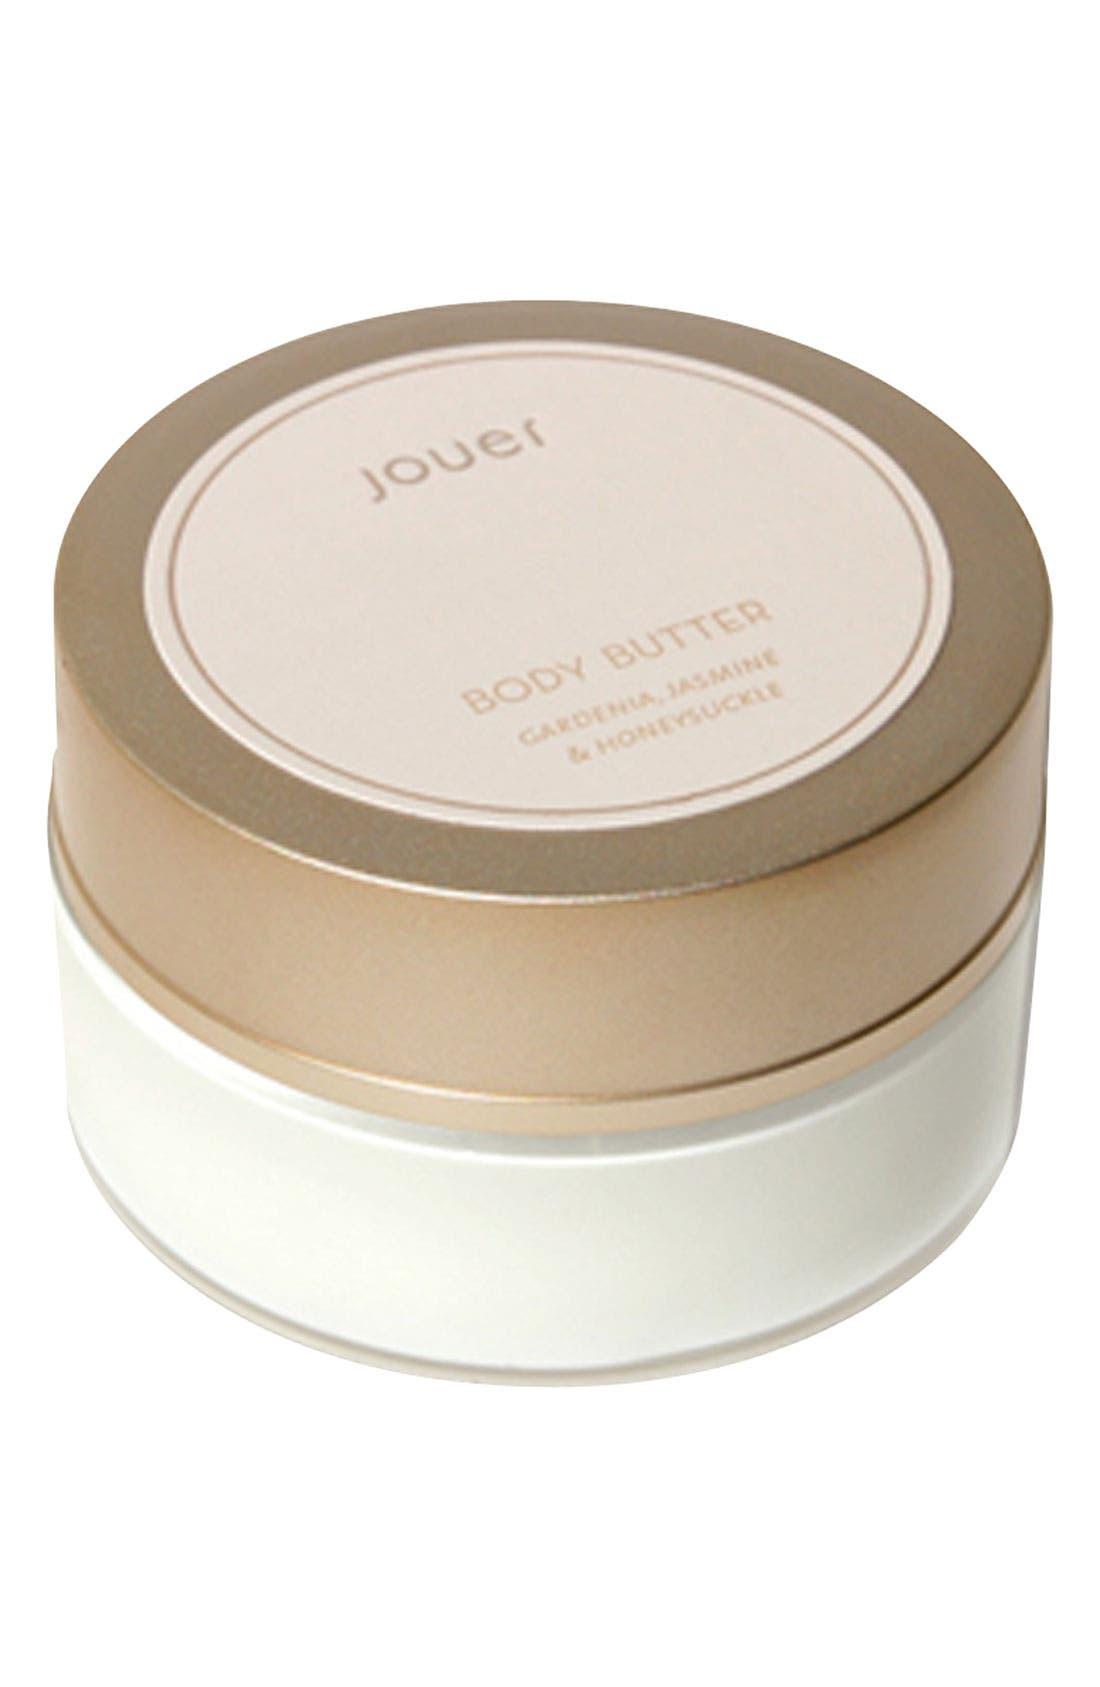 Jouer 'Gardenia, Jasmine & Honeysuckle' Body Butter